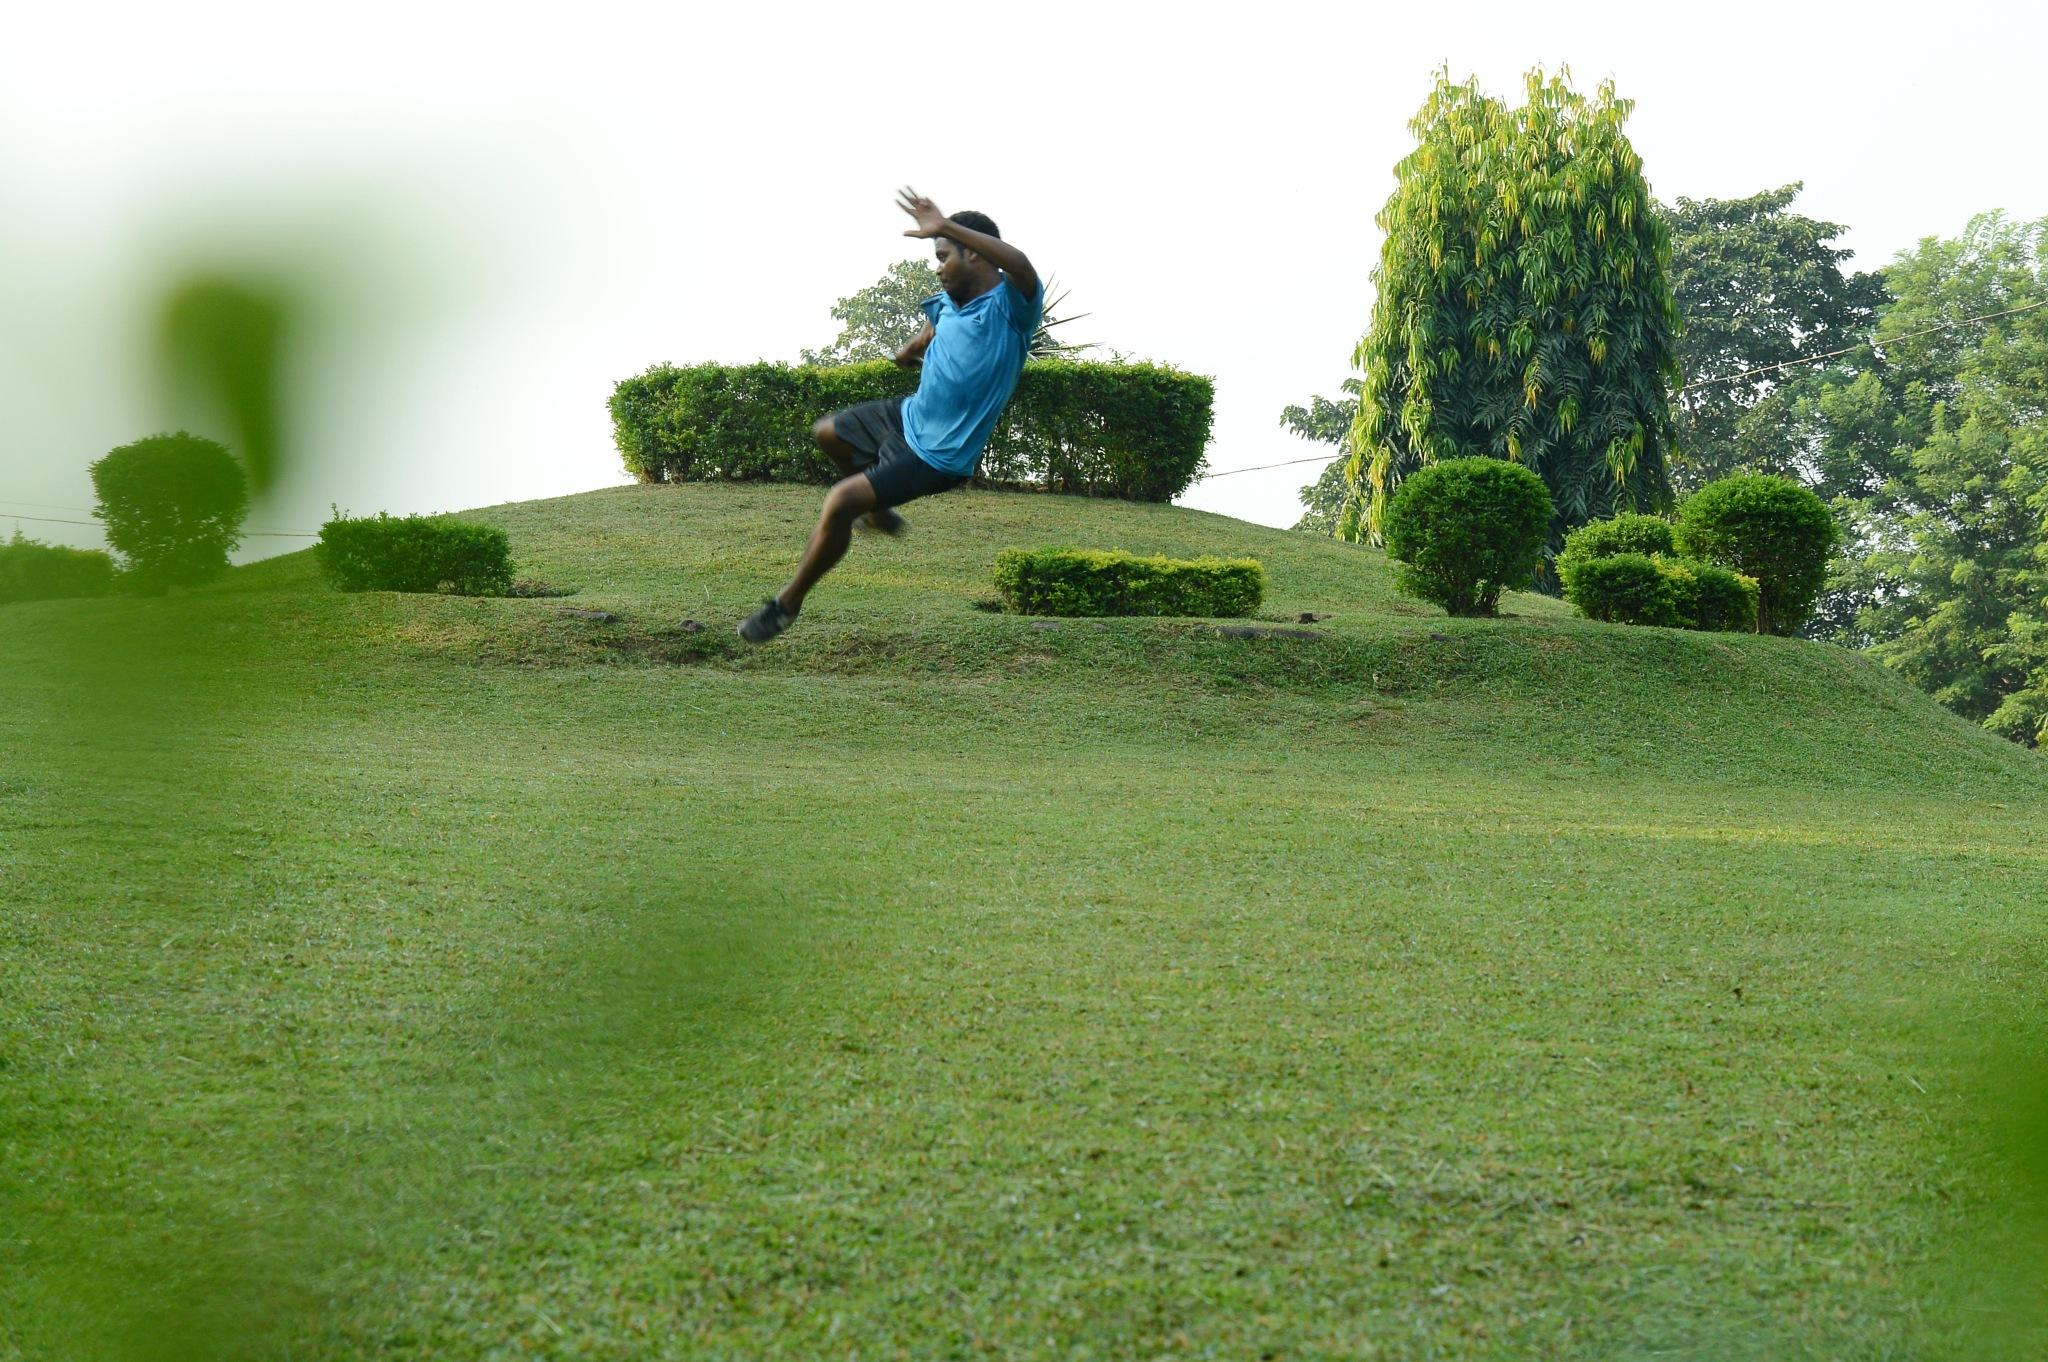 Flying in the AIR by Talmiz